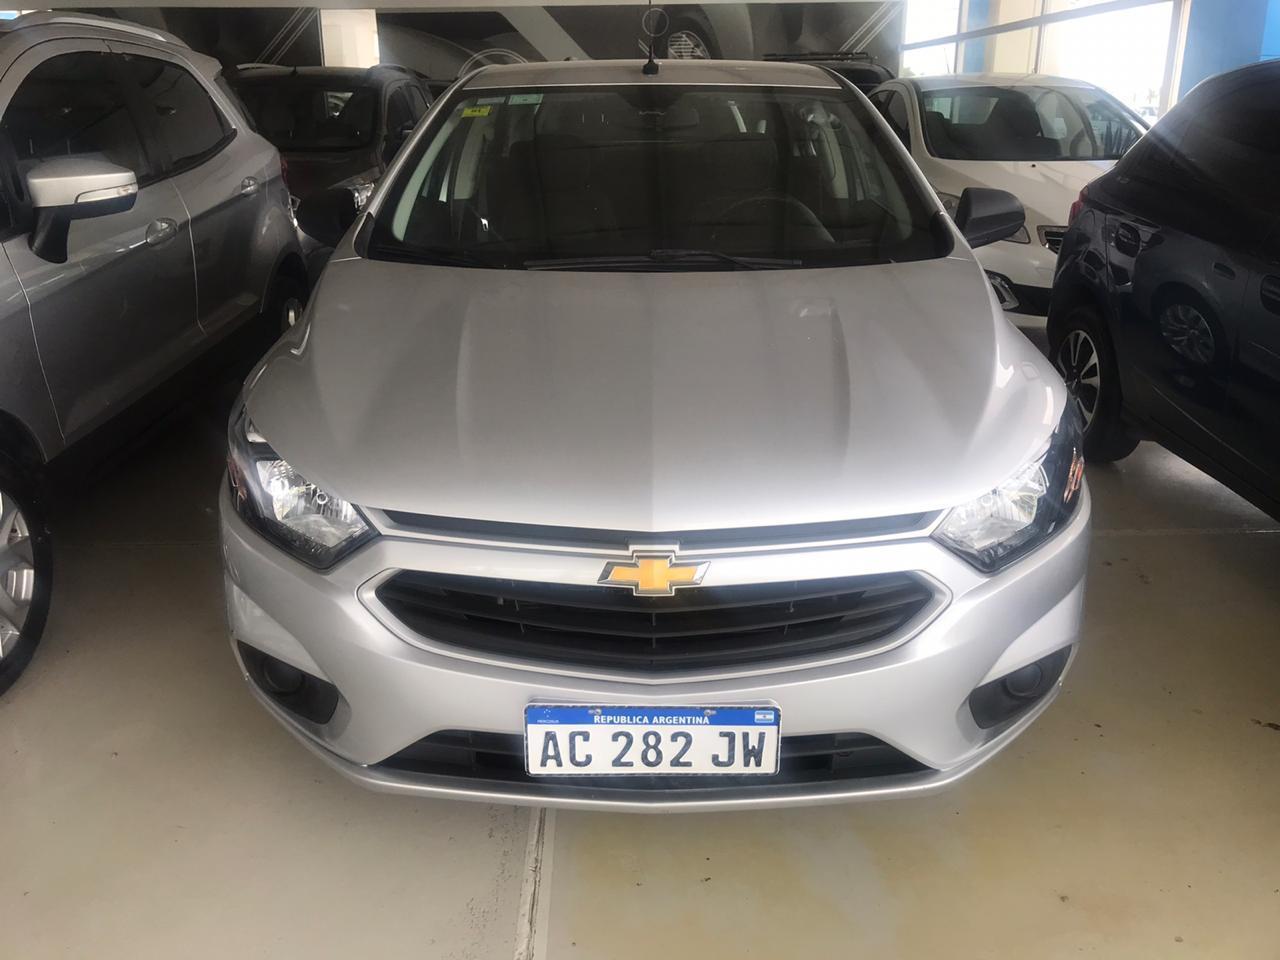 2018 Chevrolet Prisma LT 1.4L